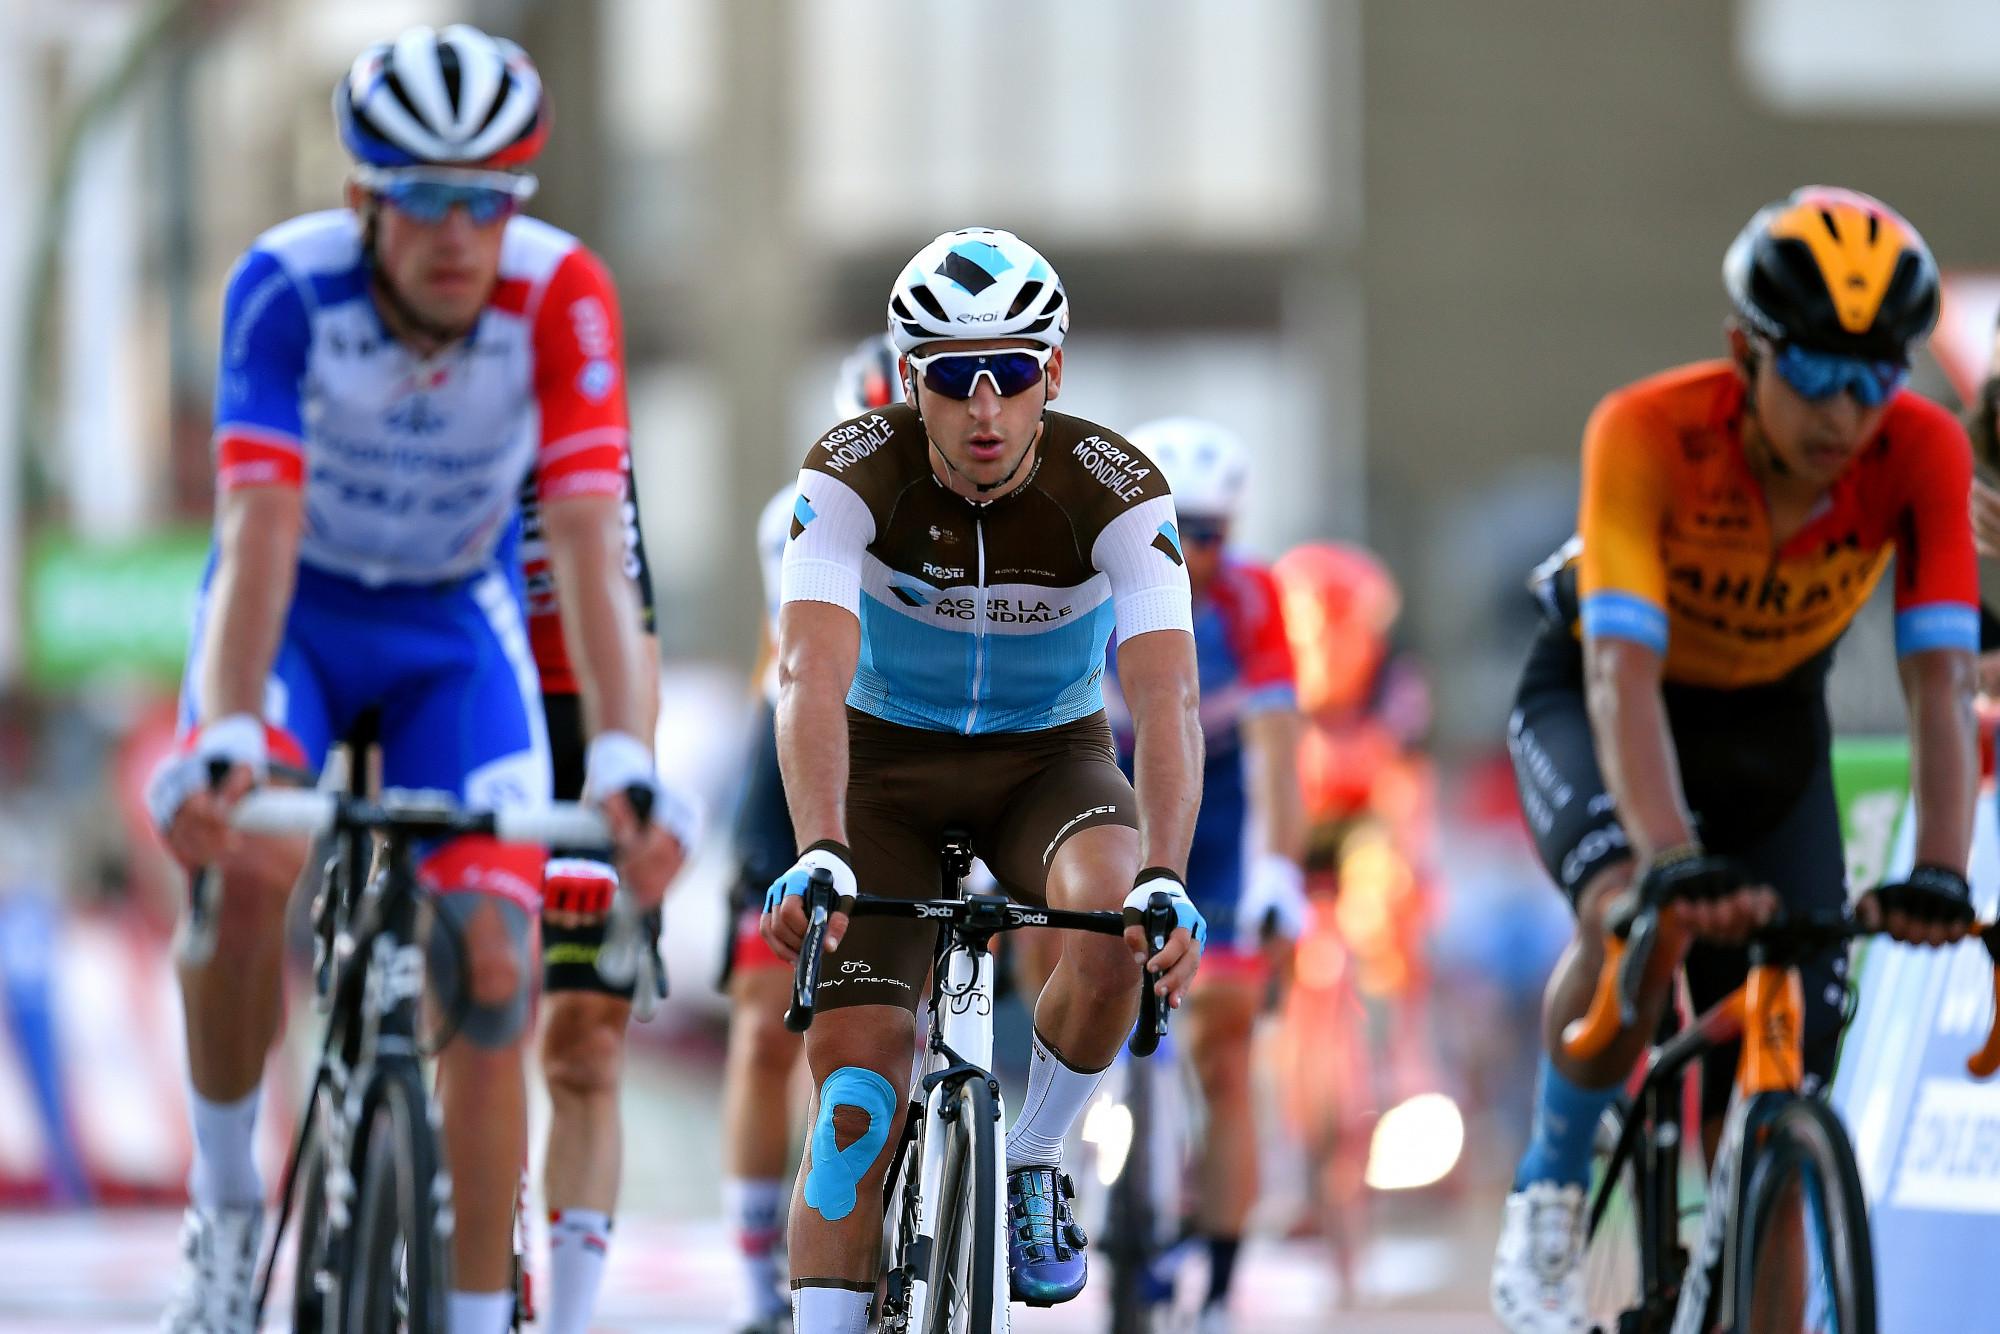 Nans Peters | La Vuelta ciclista a España - Stage 10